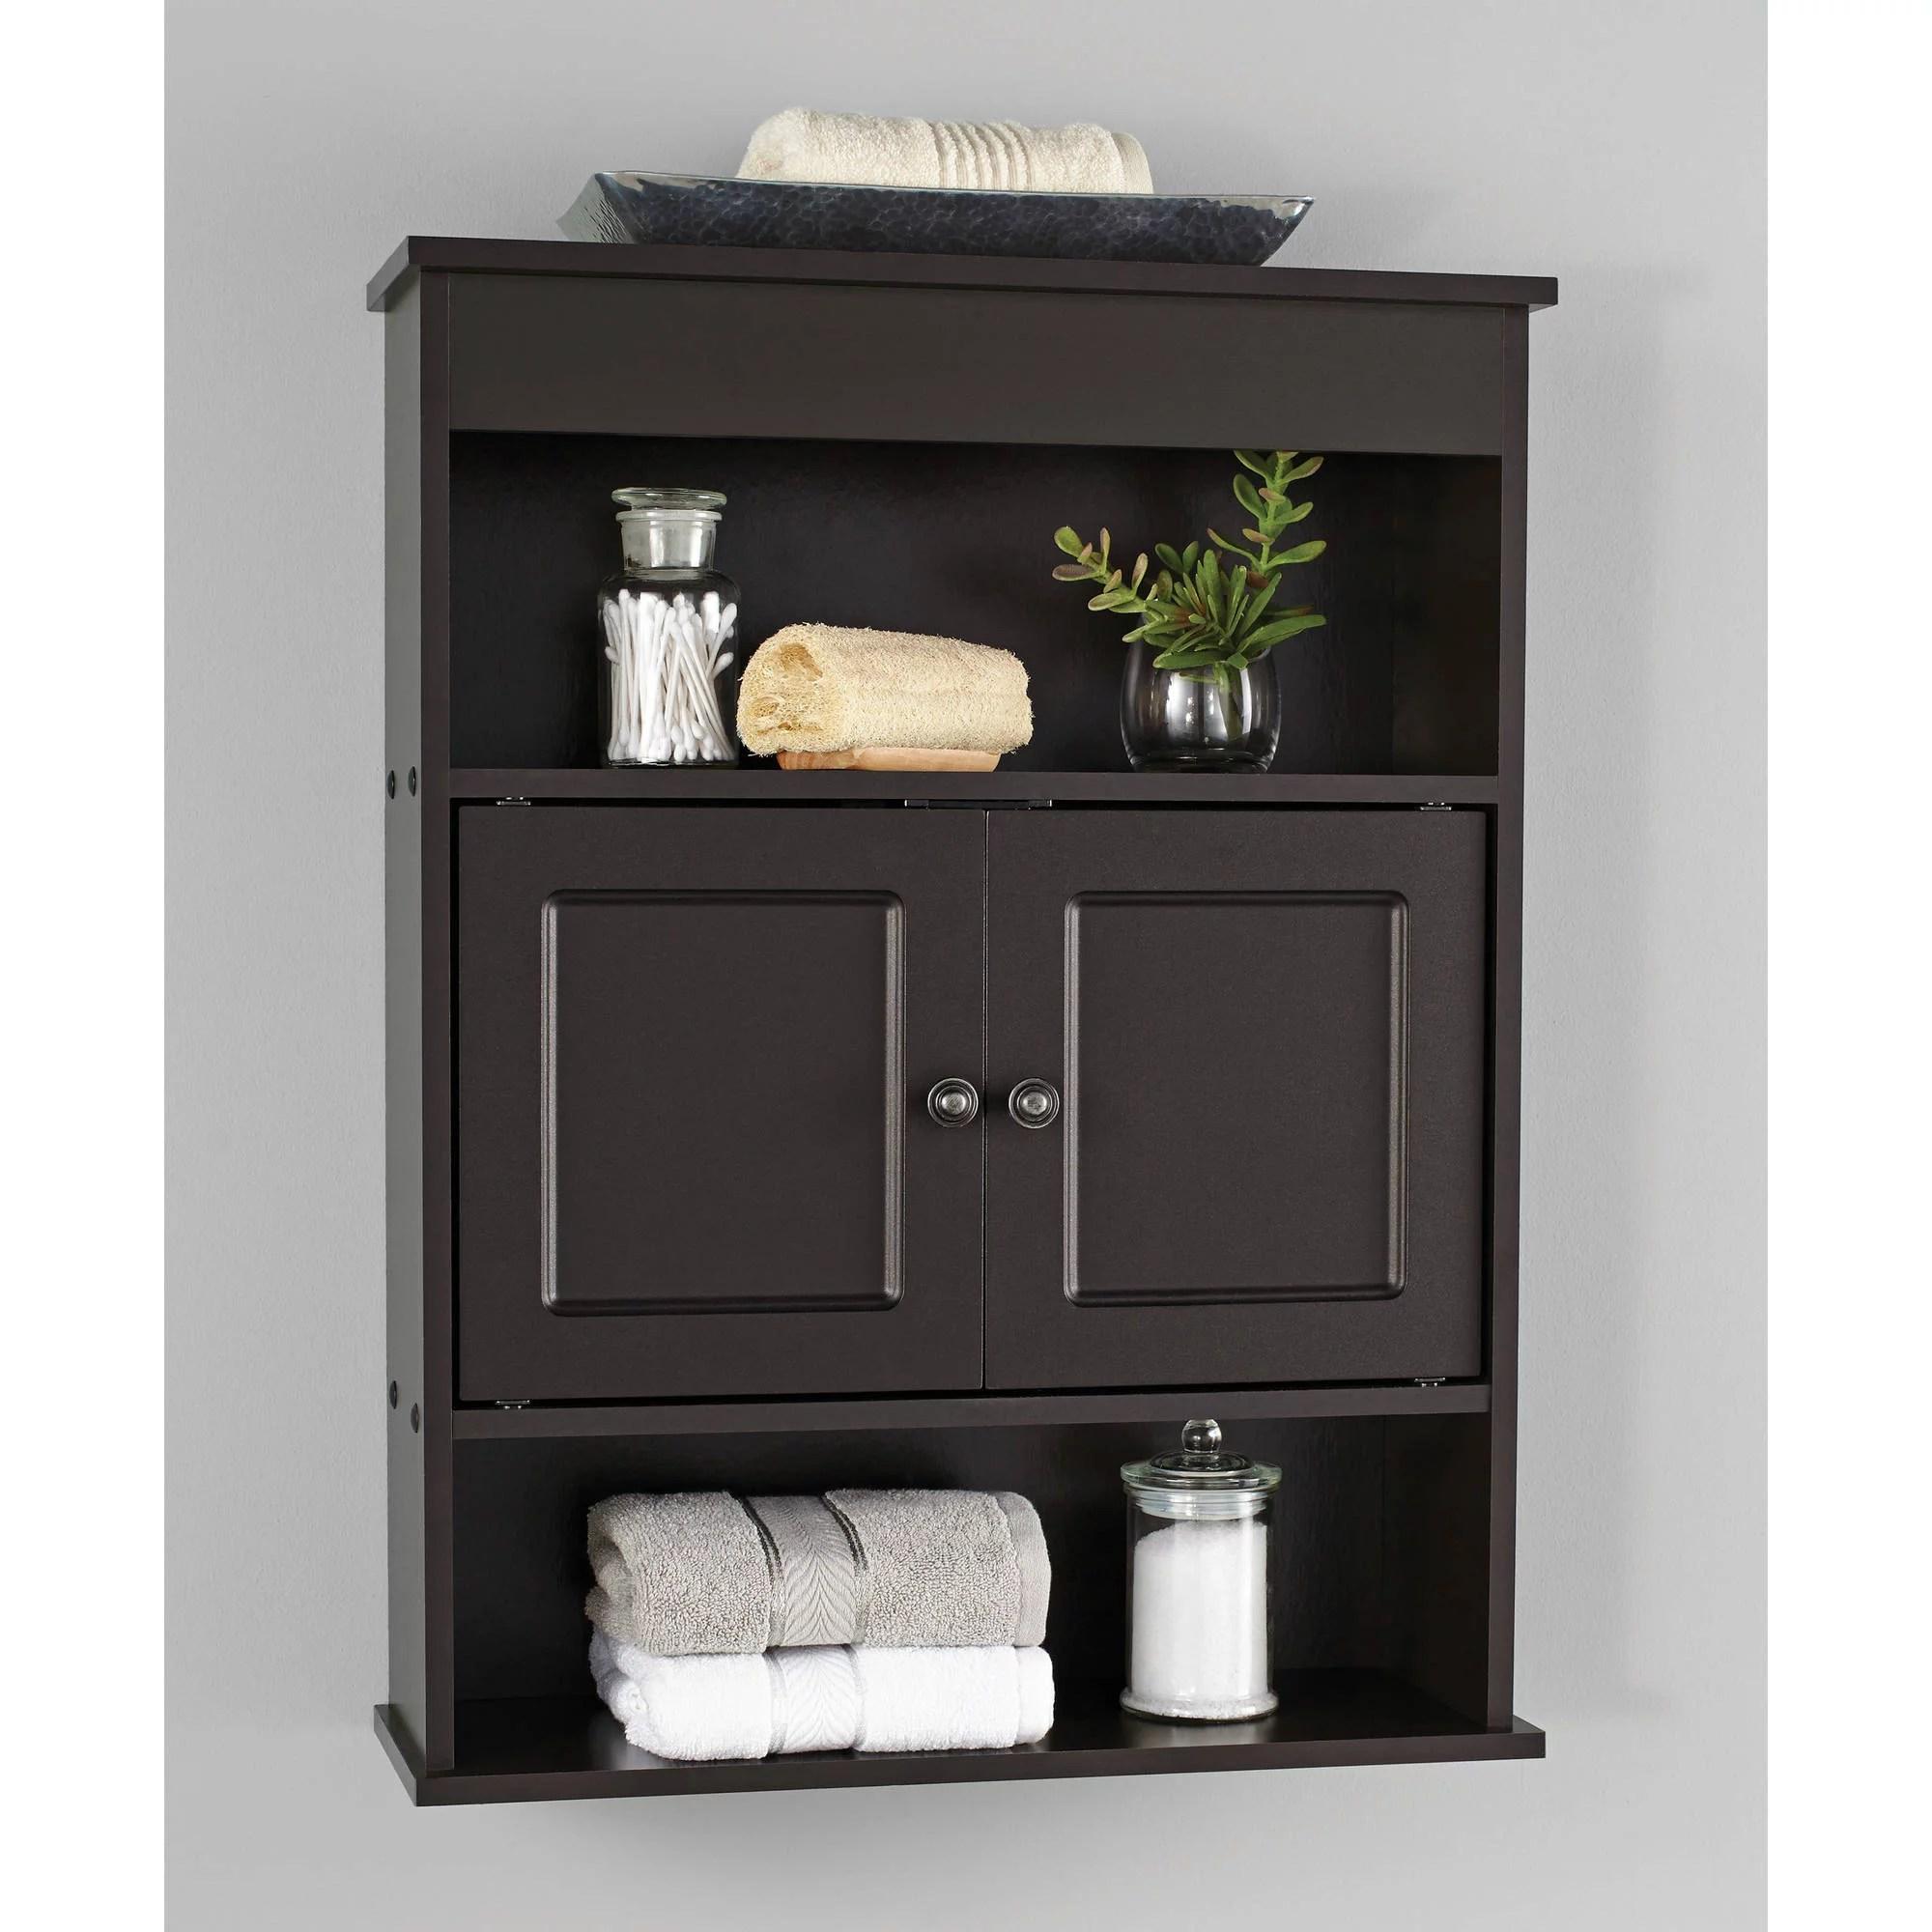 Chapter Bathroom Wall Cabinet Storage Shelf Espresso